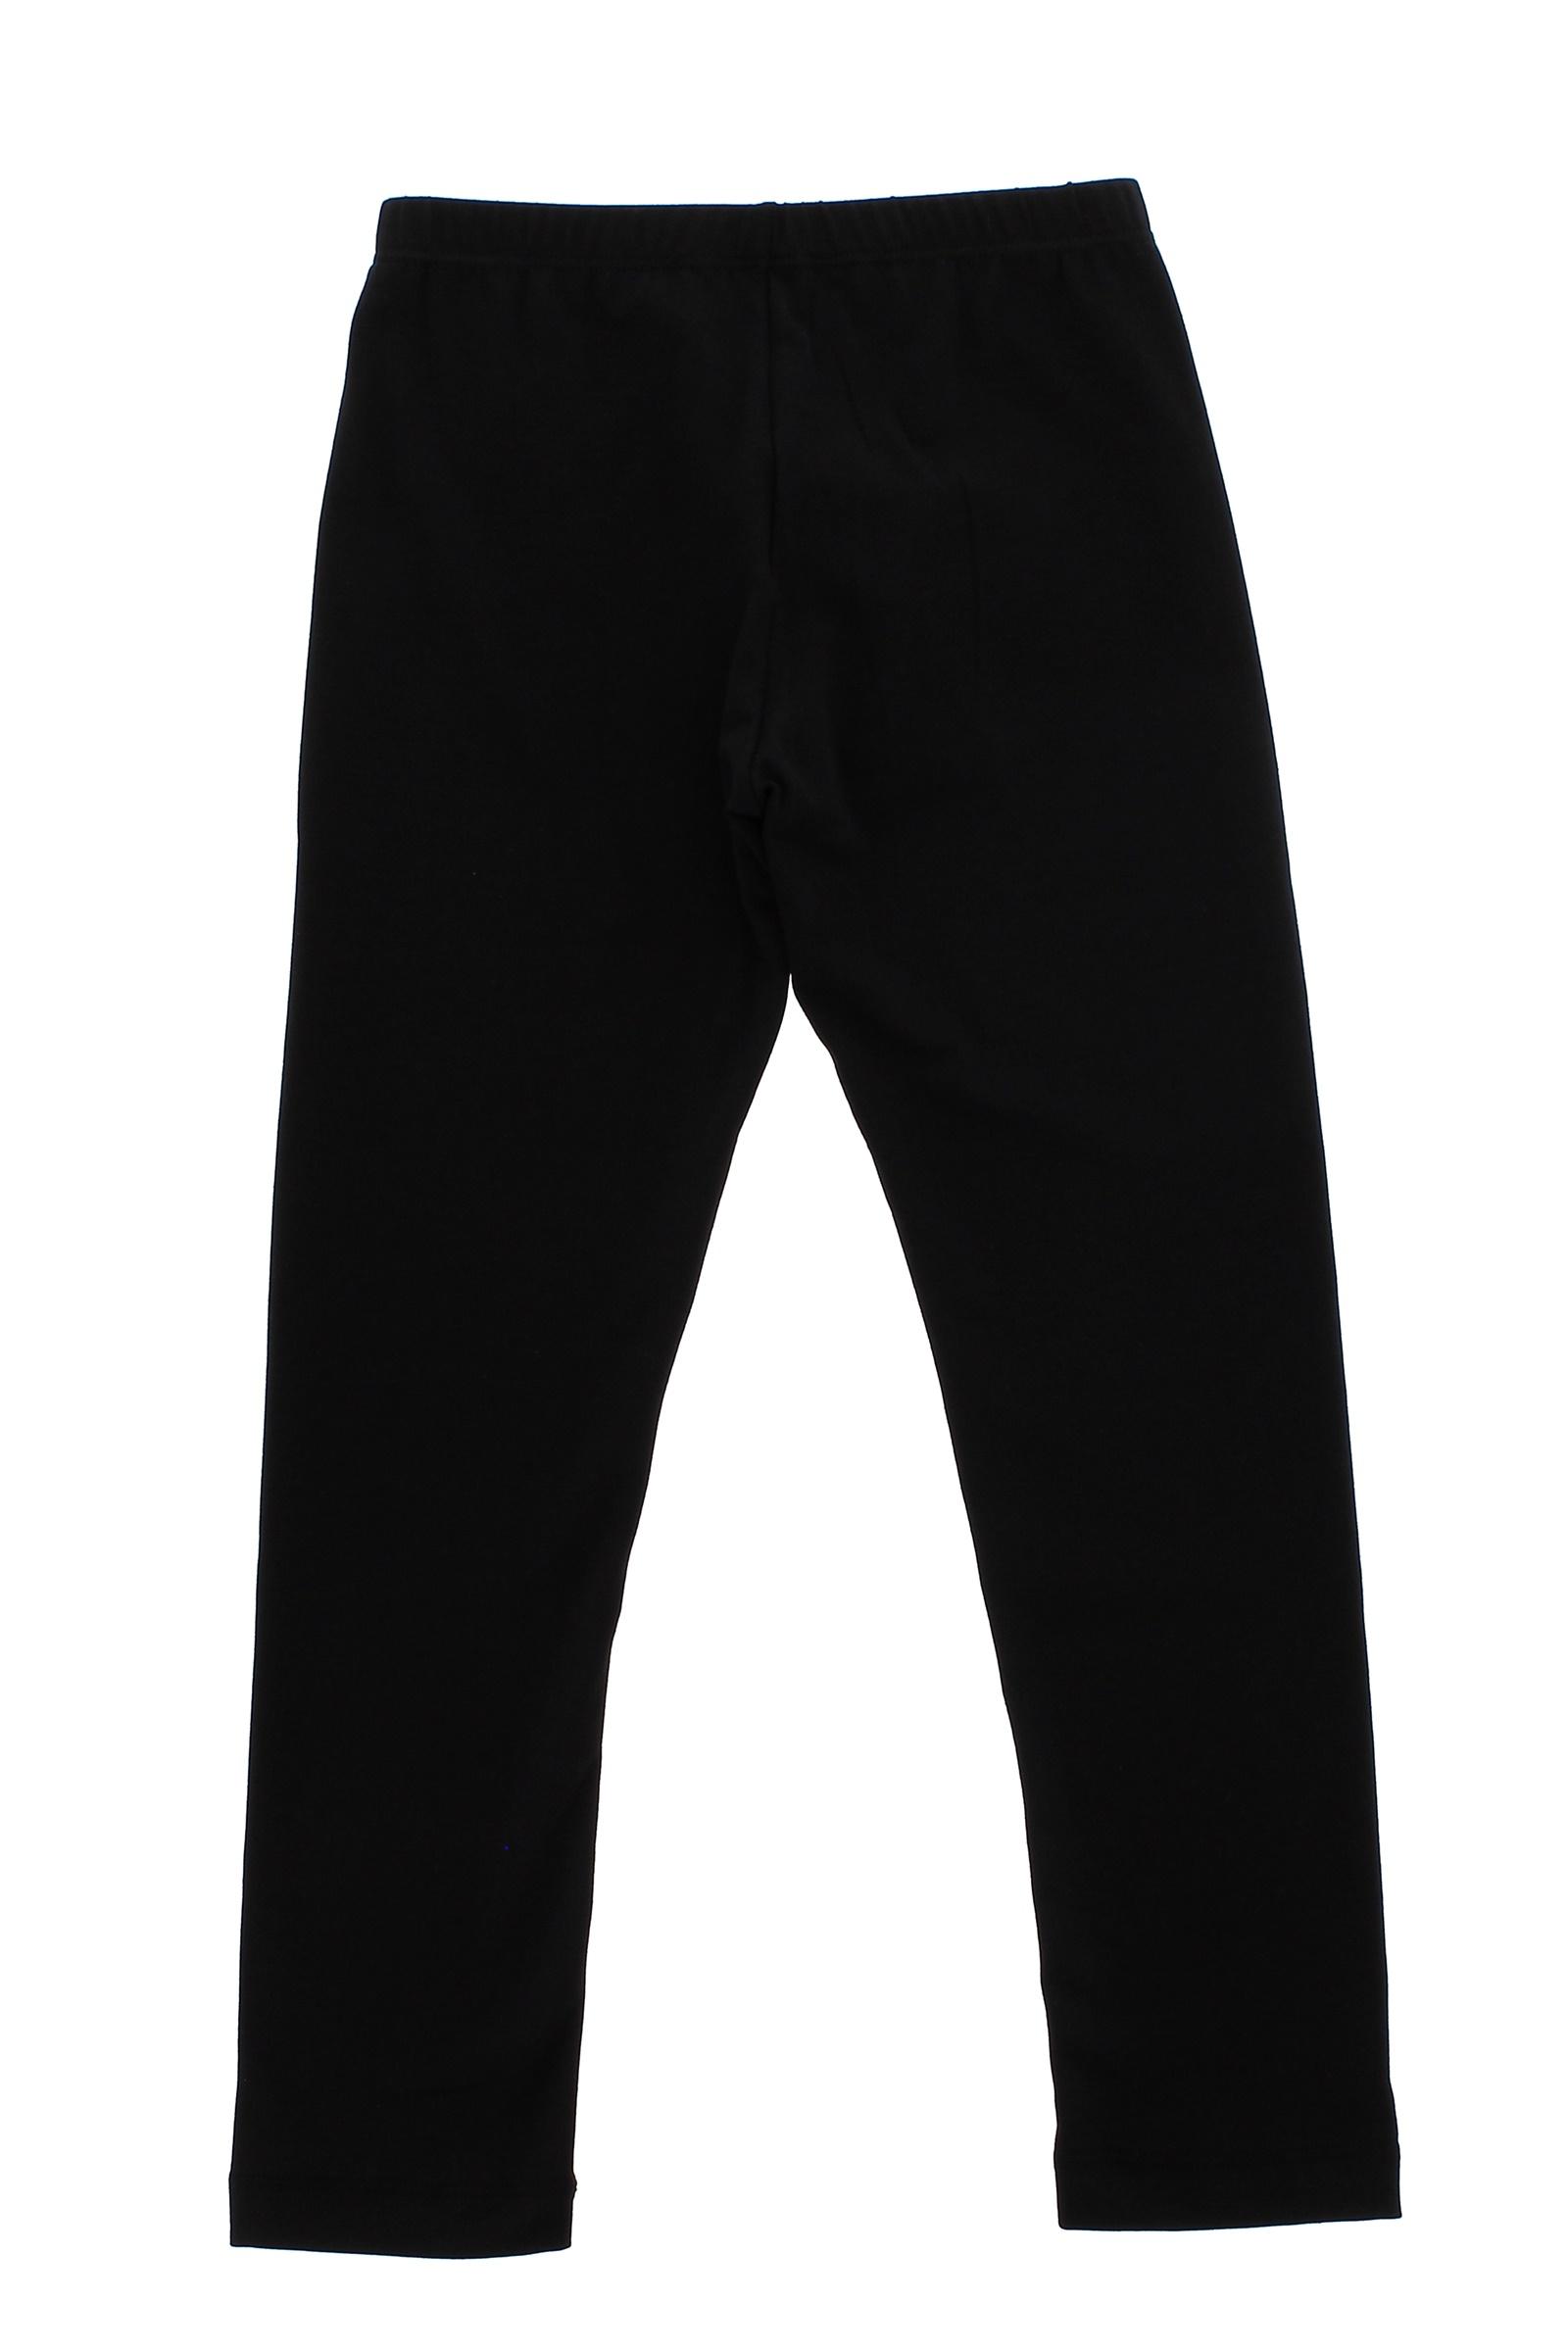 gaelle leggings Gaelle Paris | Leggins | GGPA86J1180011